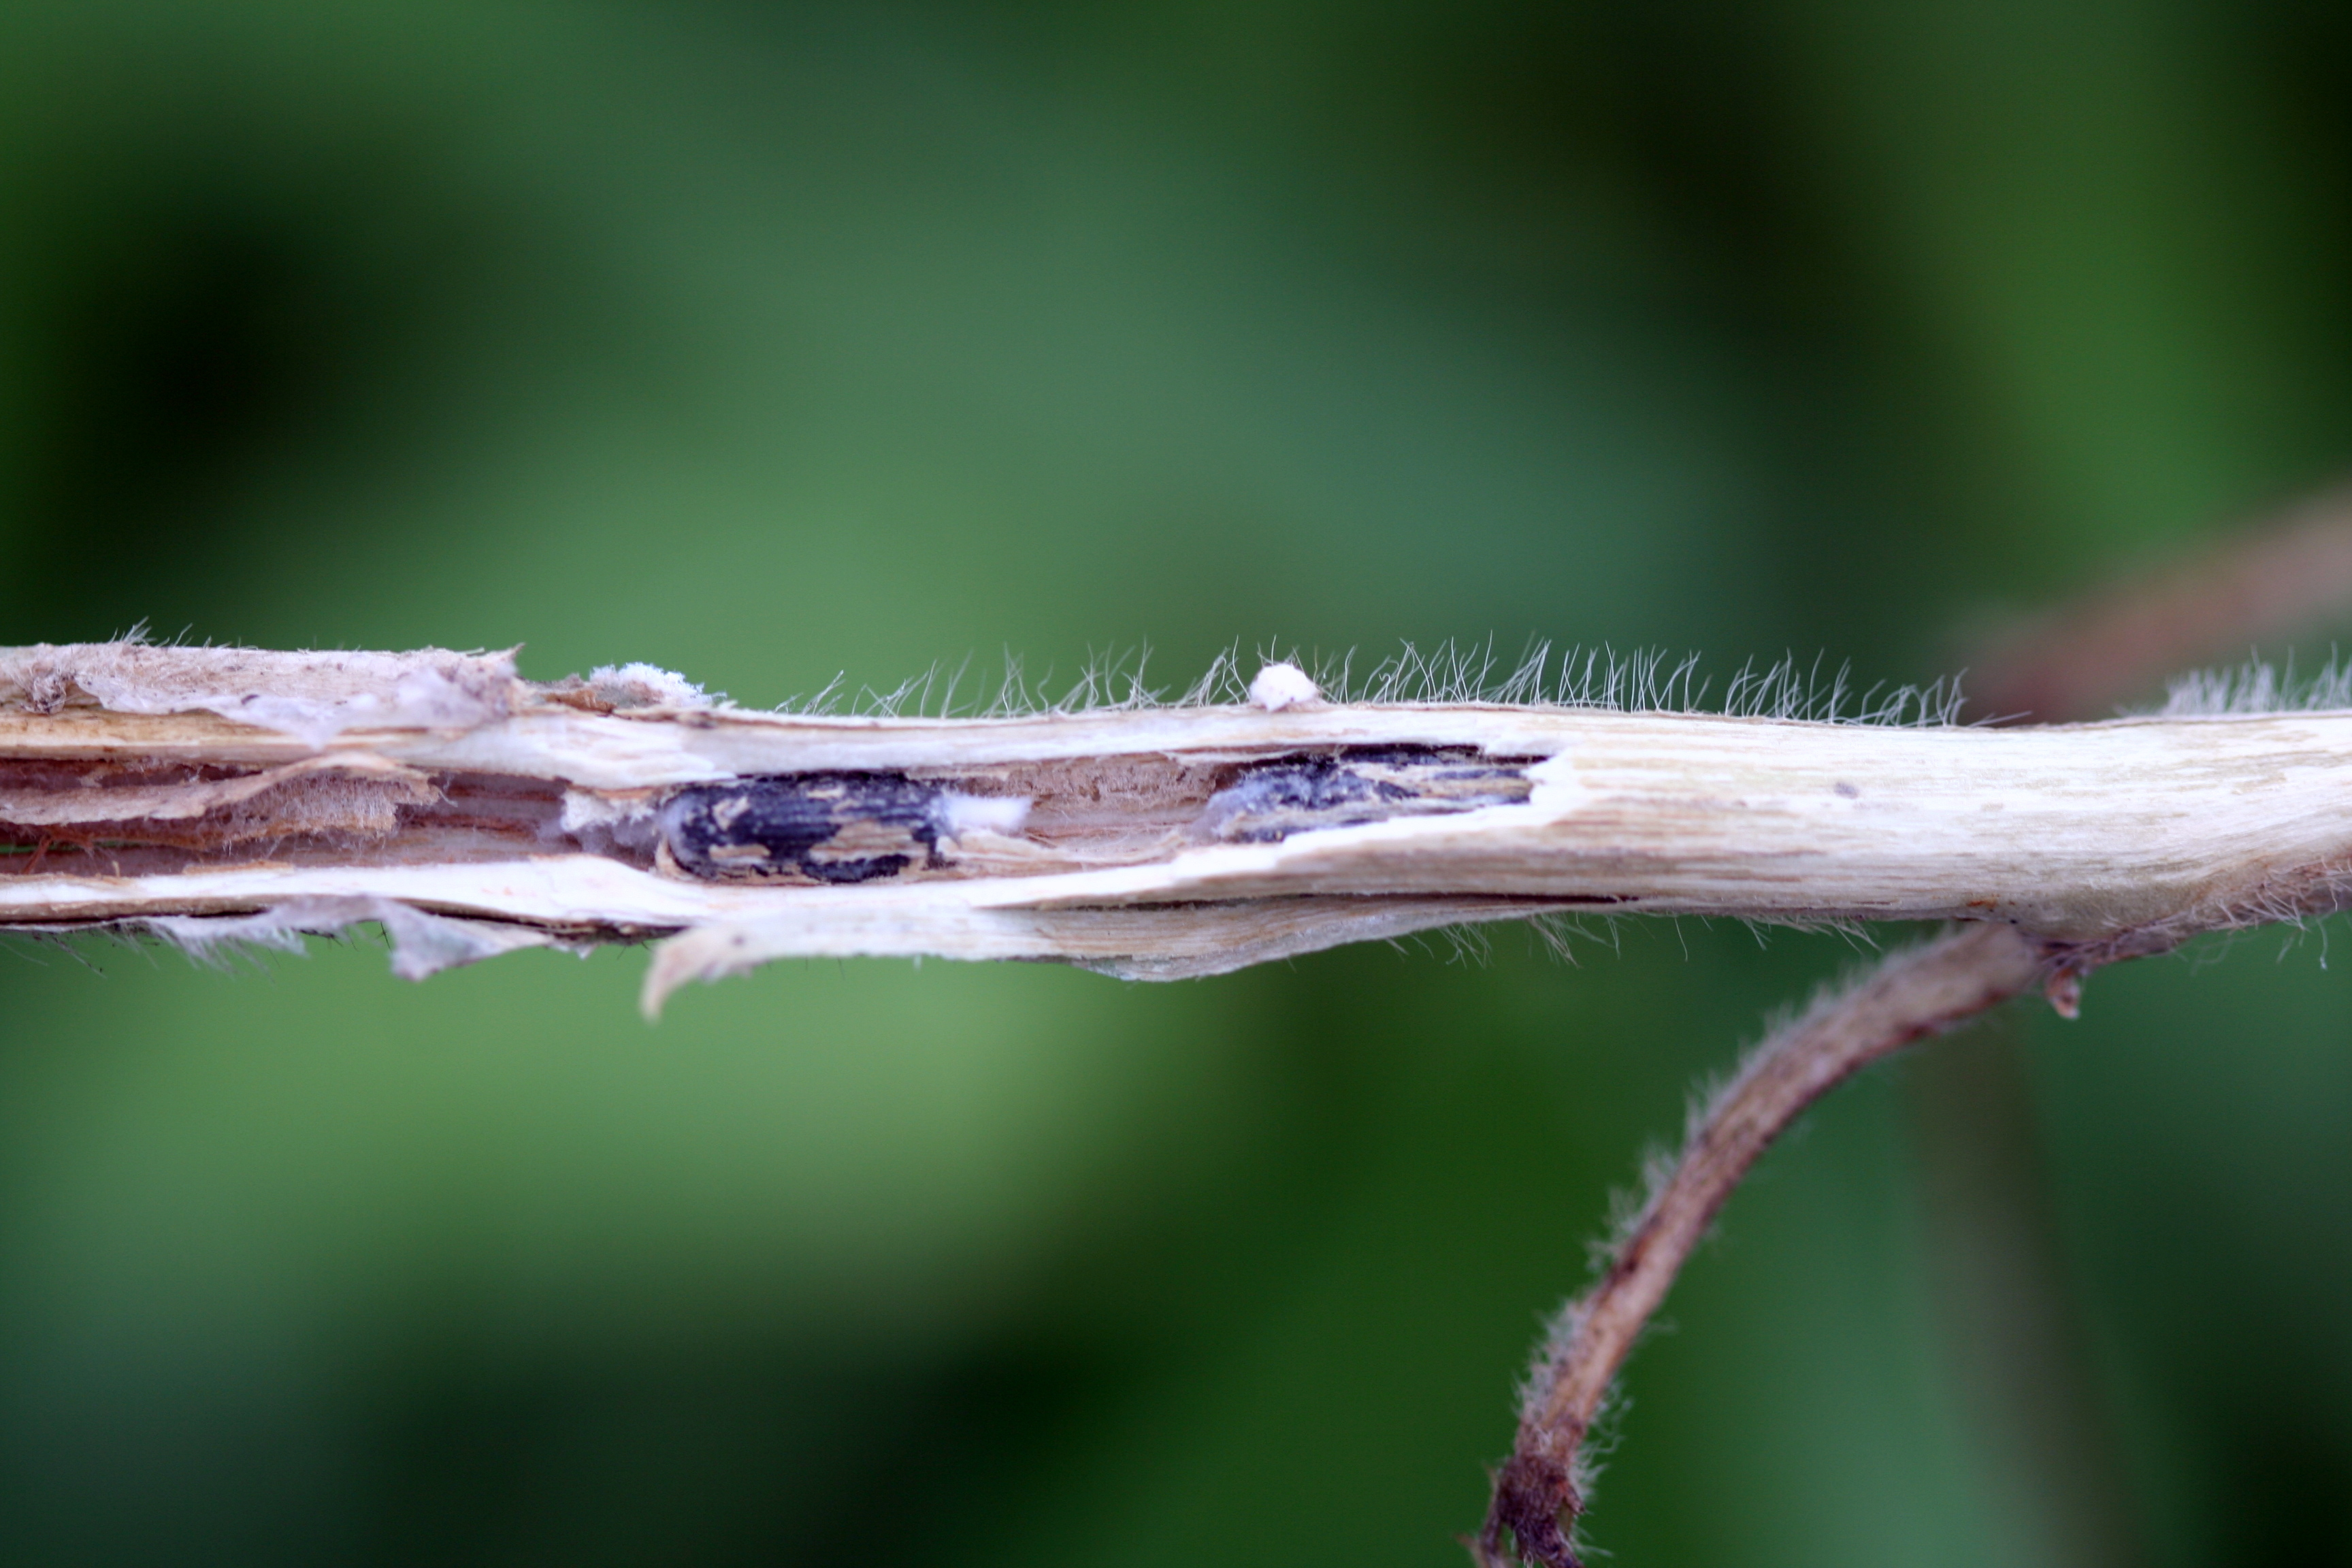 White mold sclerotia in soybean stem.